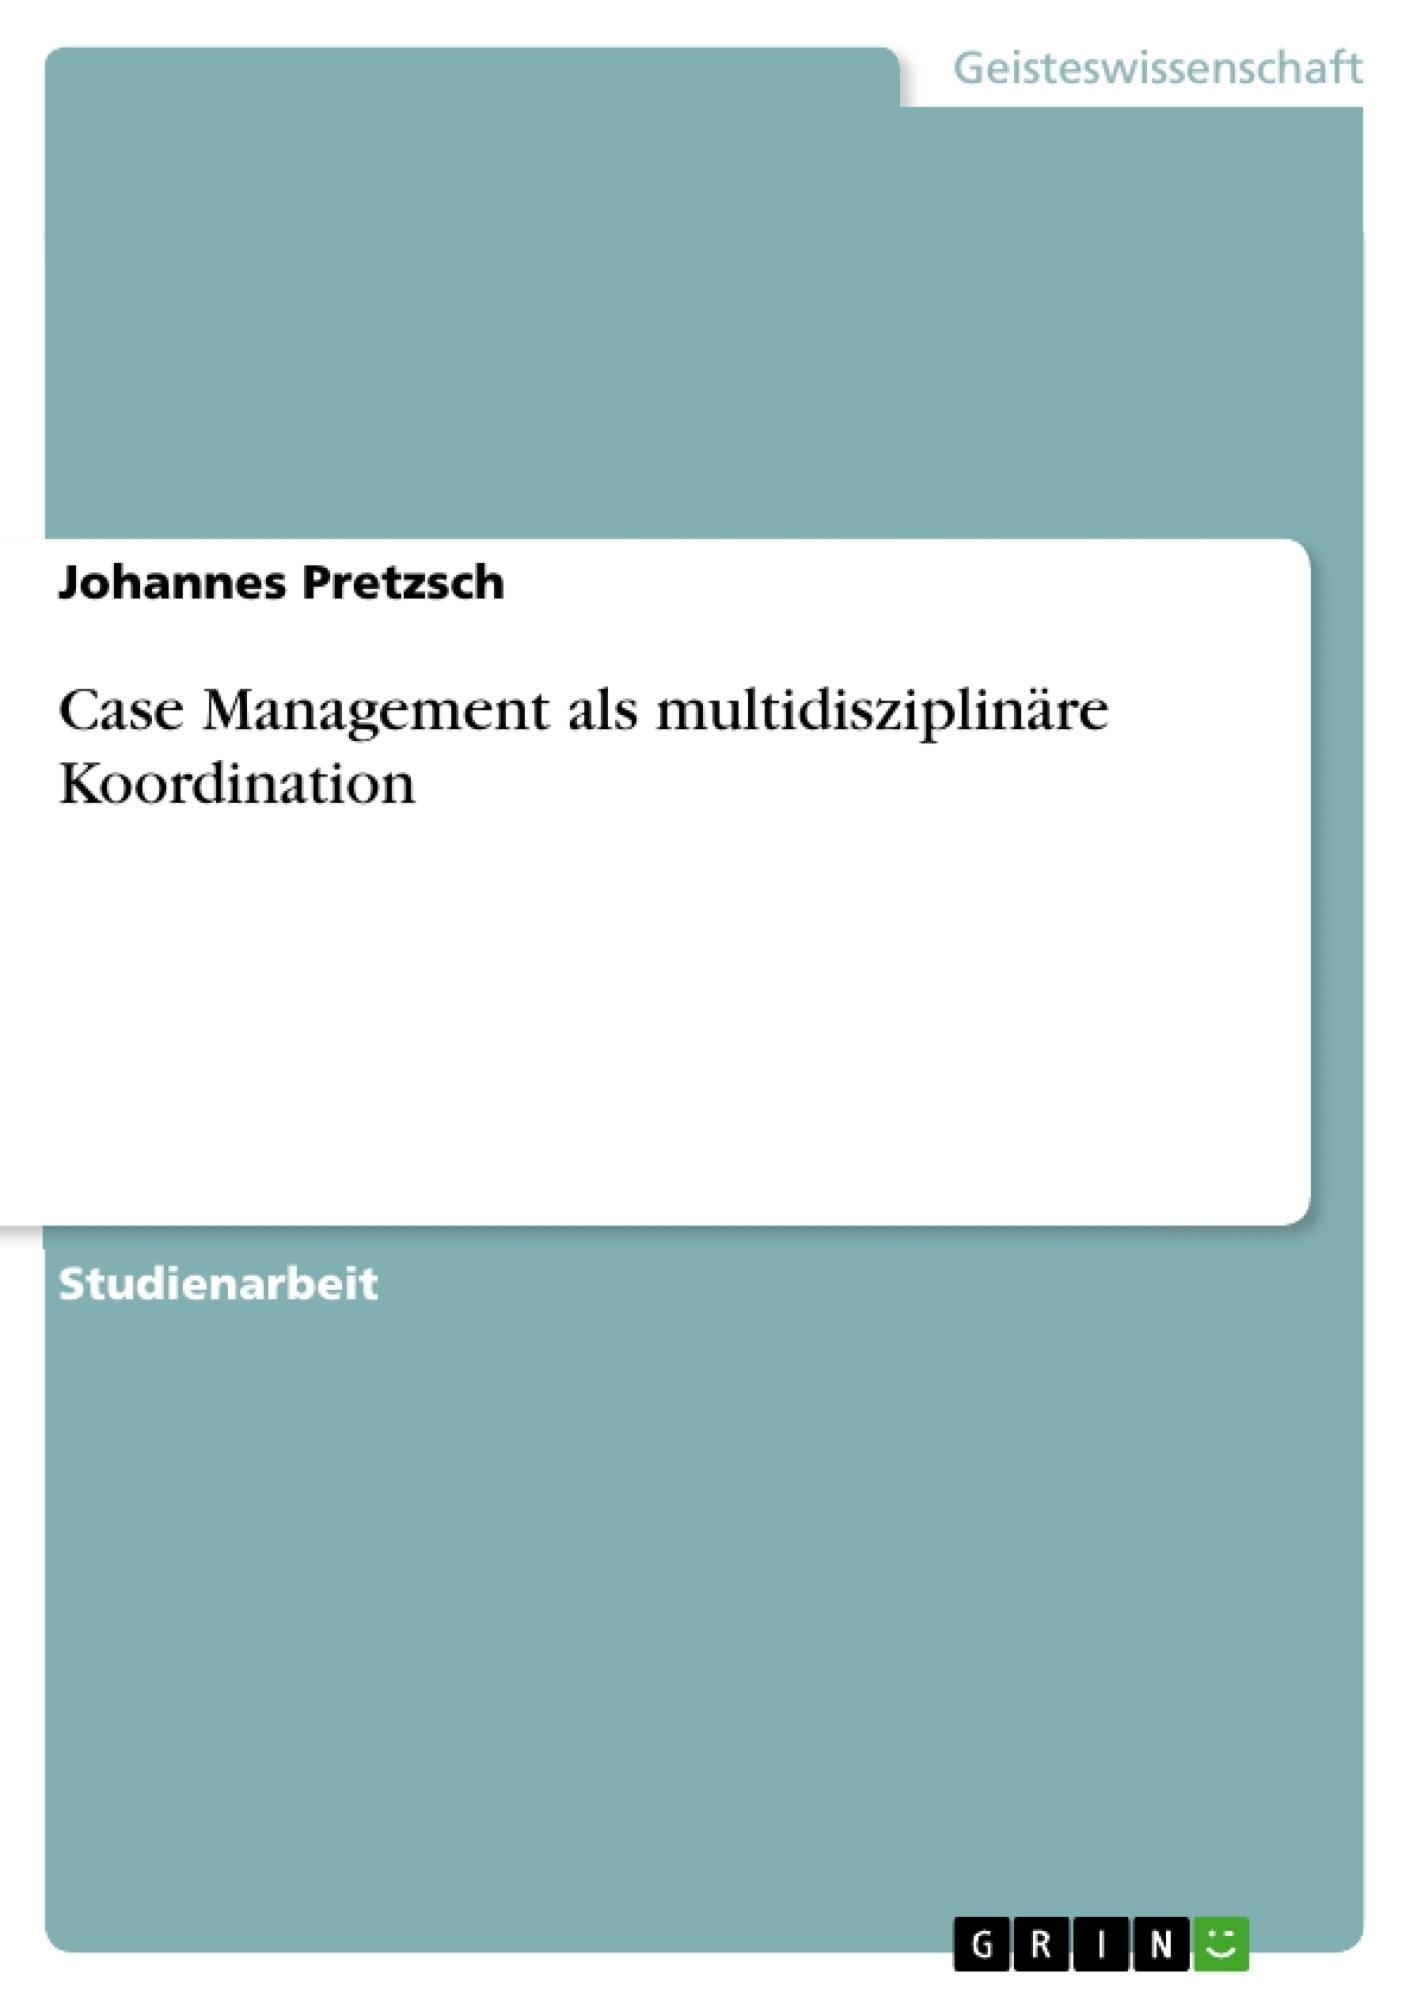 Titel: Case Management als multidisziplinäre Koordination